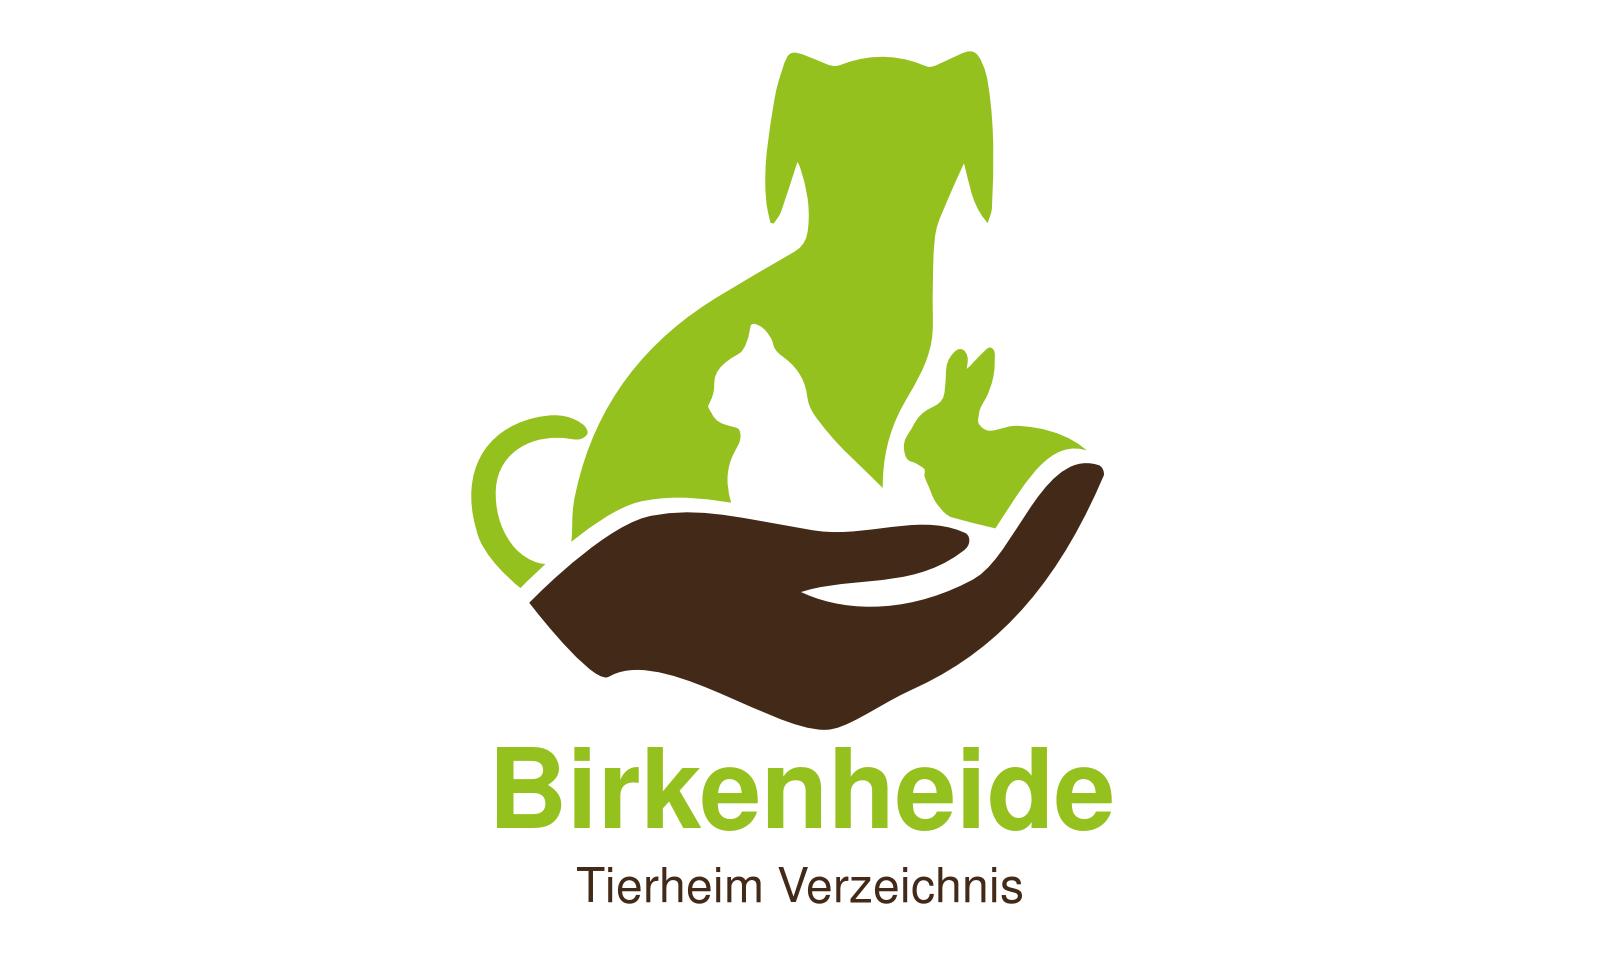 Tierheim Birkenheide